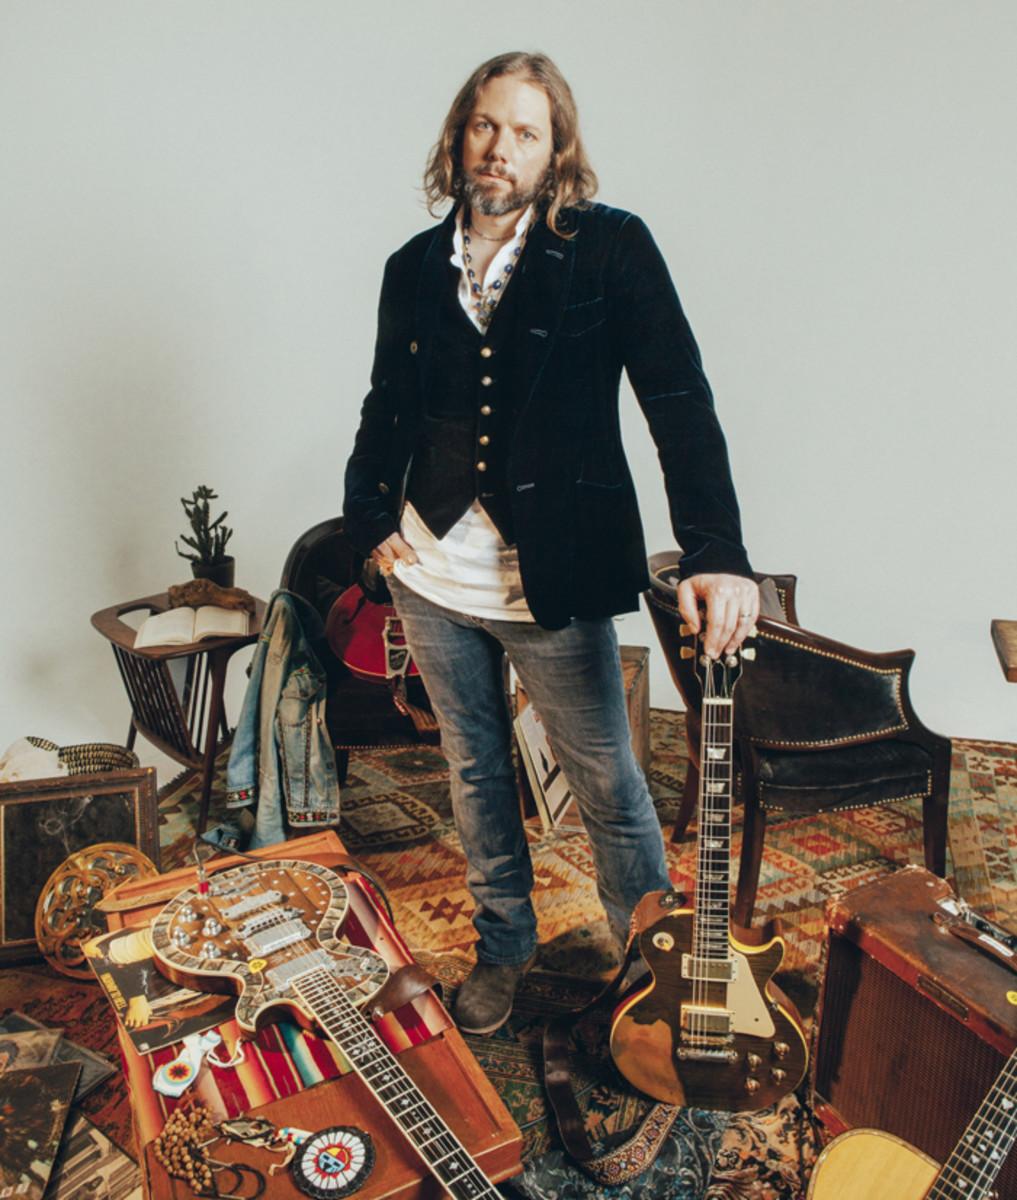 Guitarist Rich Robinson (Photo credit Alysse Gafkjen)